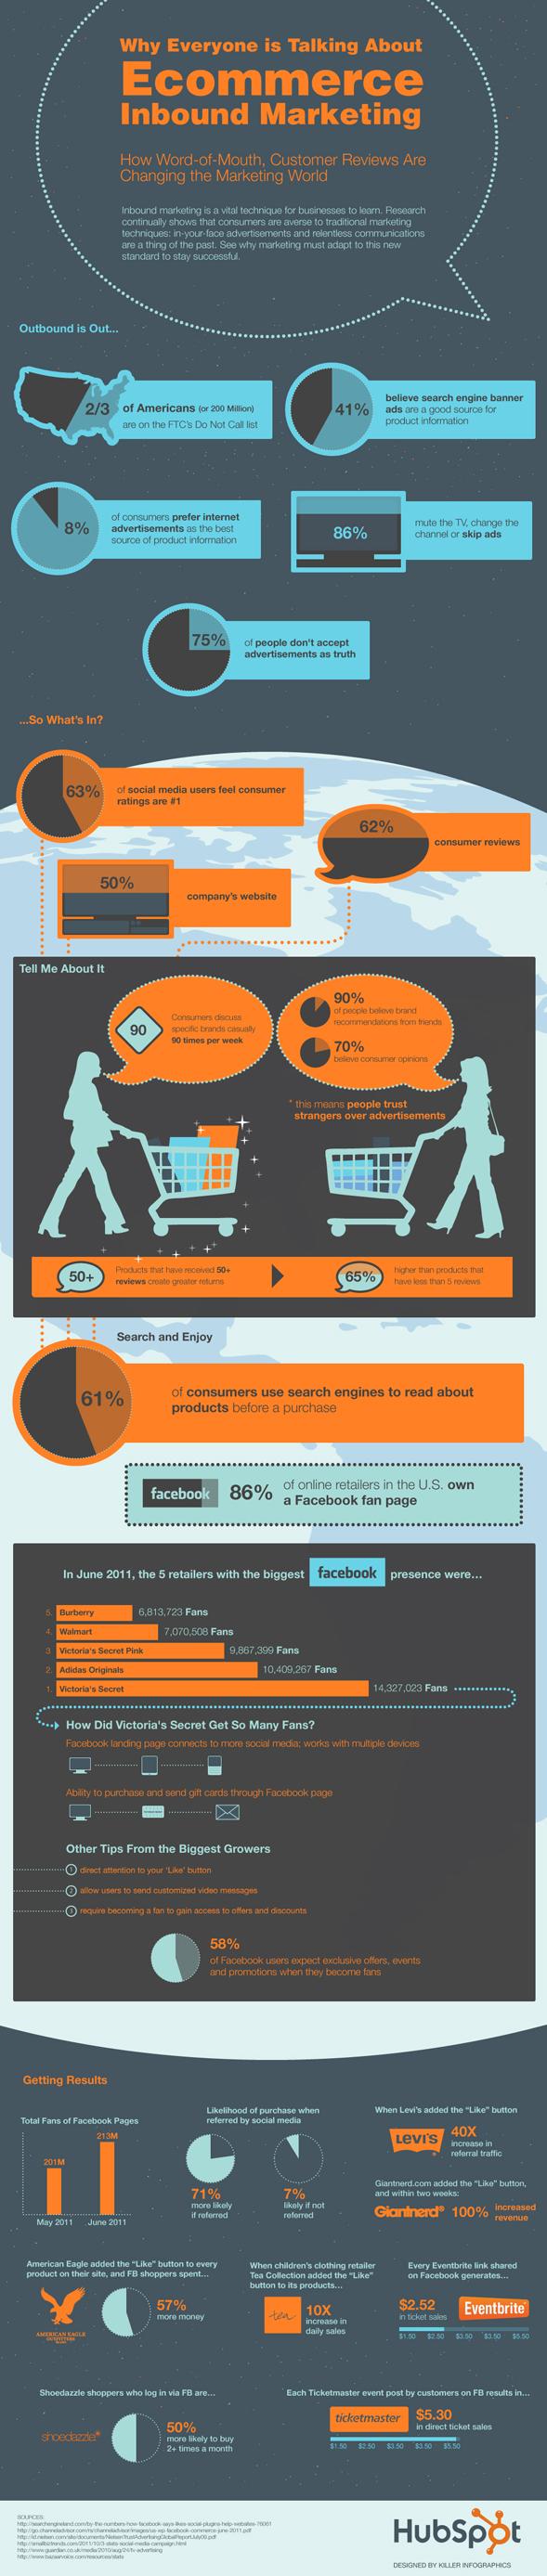 Infográfico sobre a importância da mídia social para consumidores